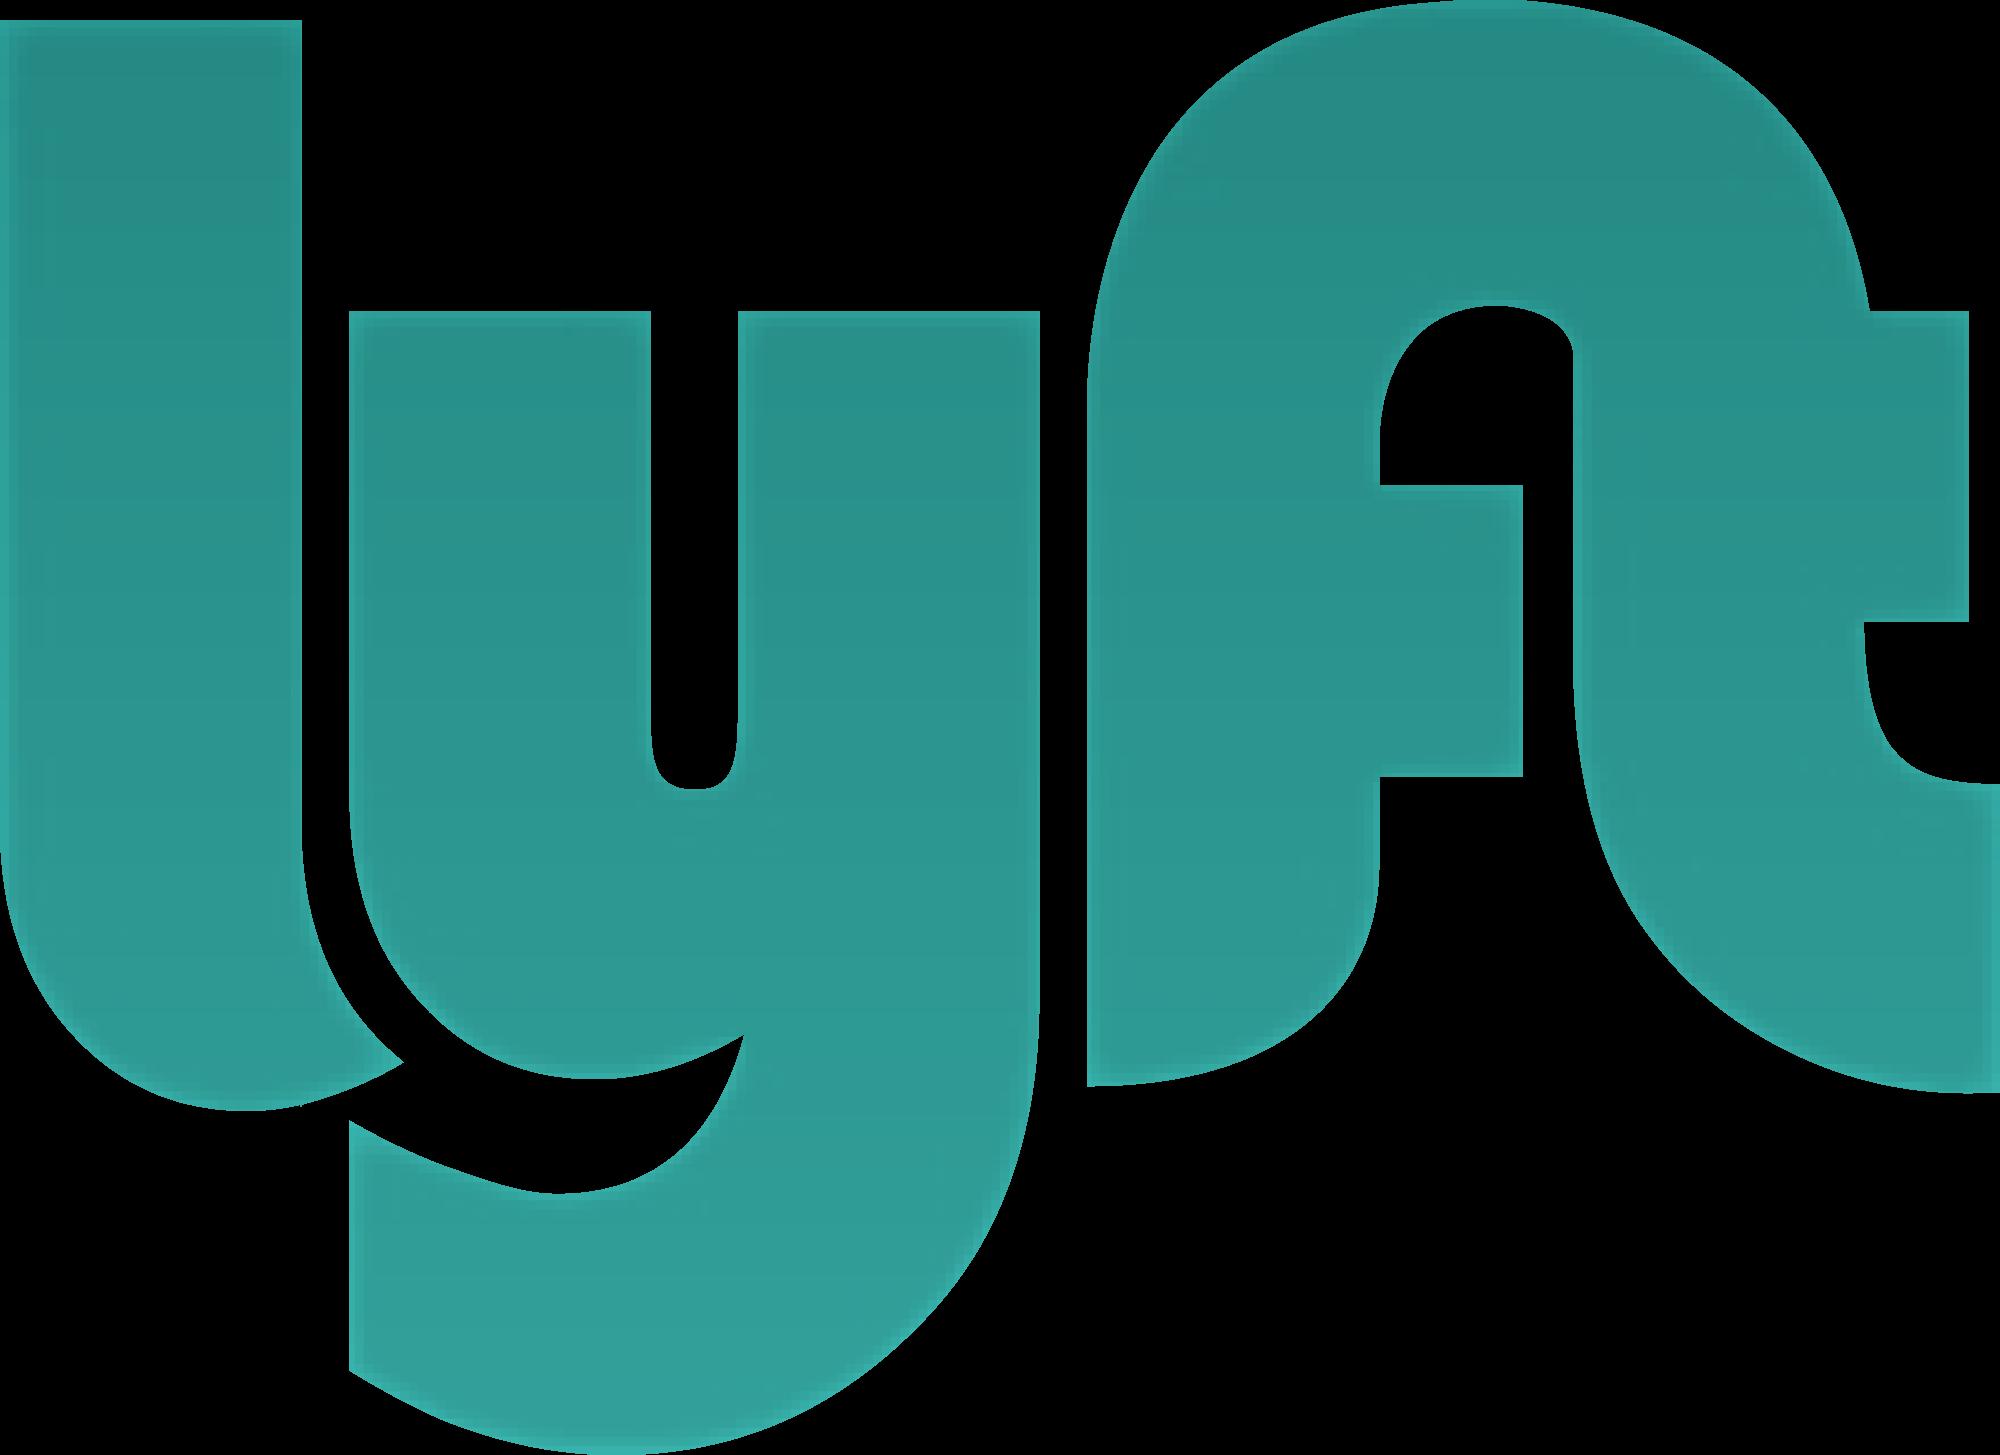 File:Lyft logo.png.